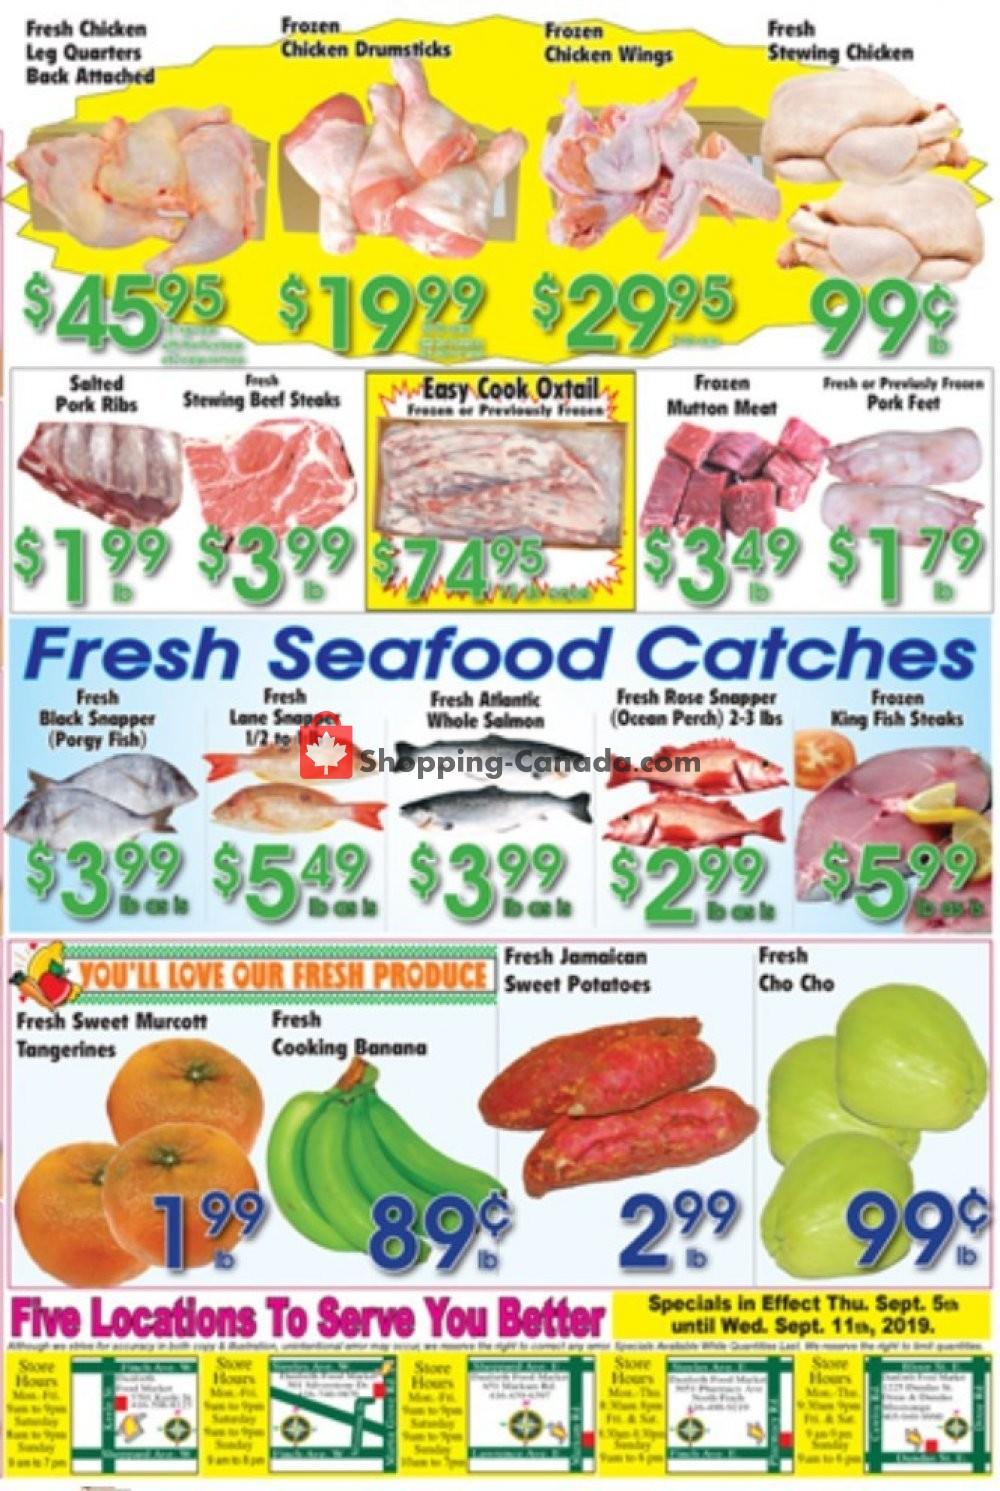 Flyer Danforth Food Market Canada - from Thursday September 5, 2019 to Wednesday September 11, 2019